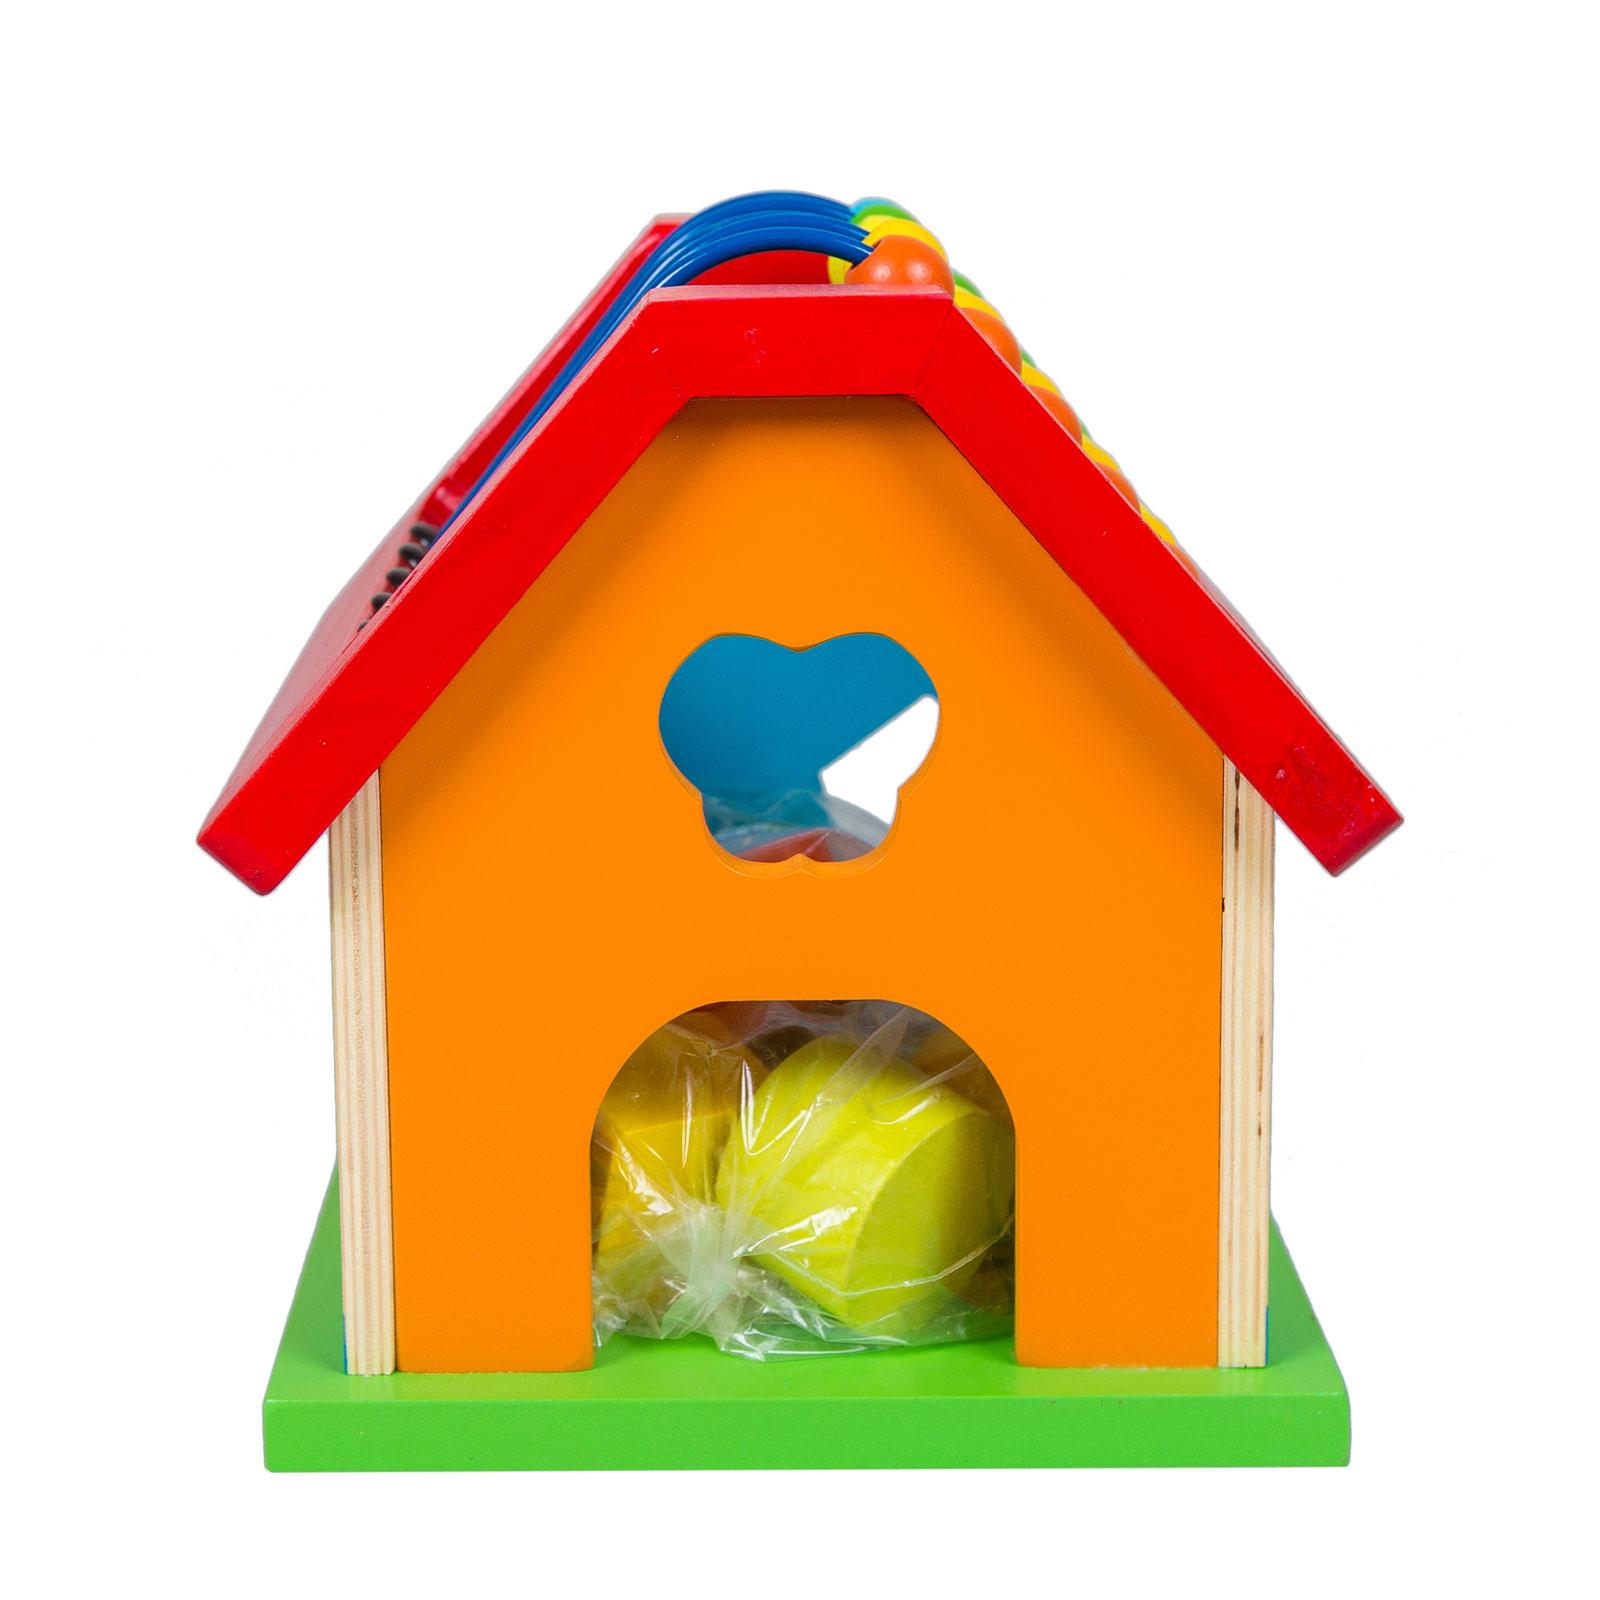 Развивающая игрушка Eichhorn Развивающая игрушка-сортер Домик с 12 мес. от Младенец.ru